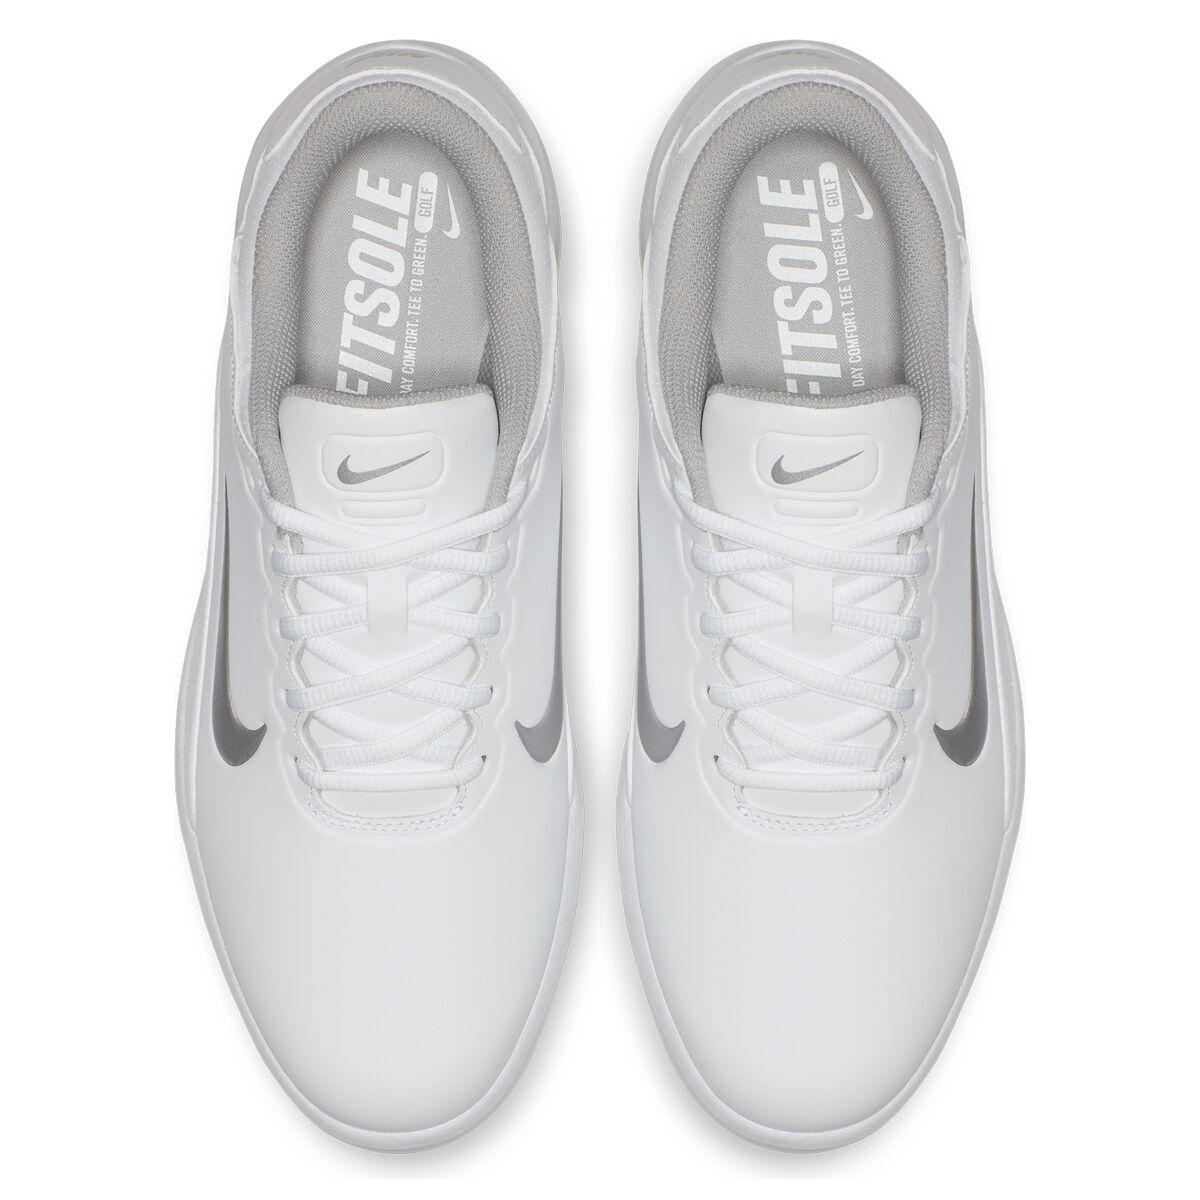 Nike Vapor Mens Golf Shoes | Rebel Sport